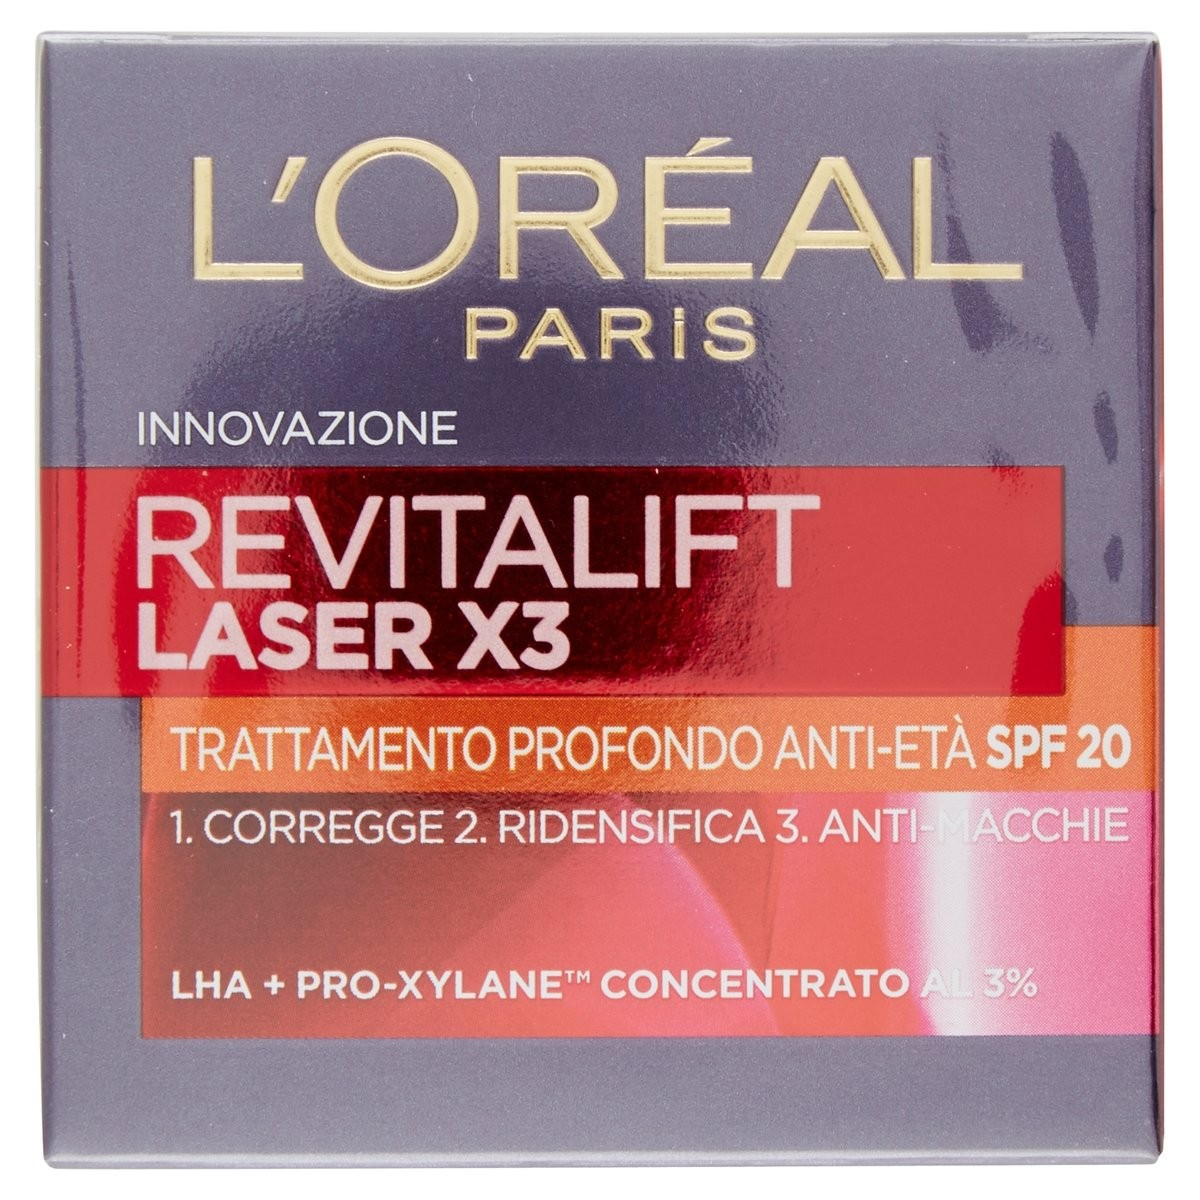 L'Oréal Paris Crema viso Revitalift Laser X3